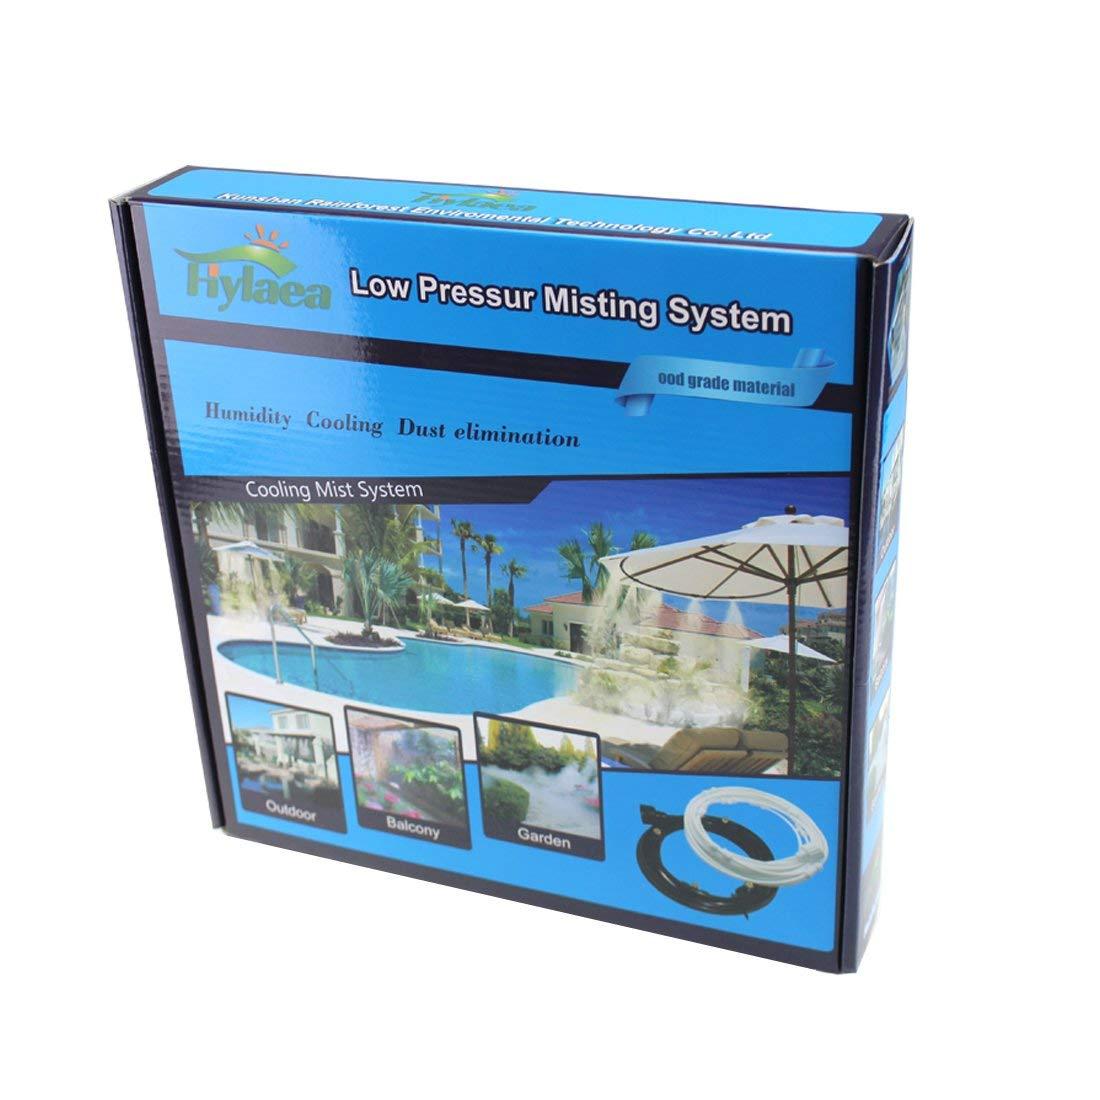 Hylaea 6m (20feet) Portable 1/4'' Outdoor Patio Mist Cooling System, Outdoor Misting System, Outdoor Misting Kit For Patio, Lawn, Garden (6m)